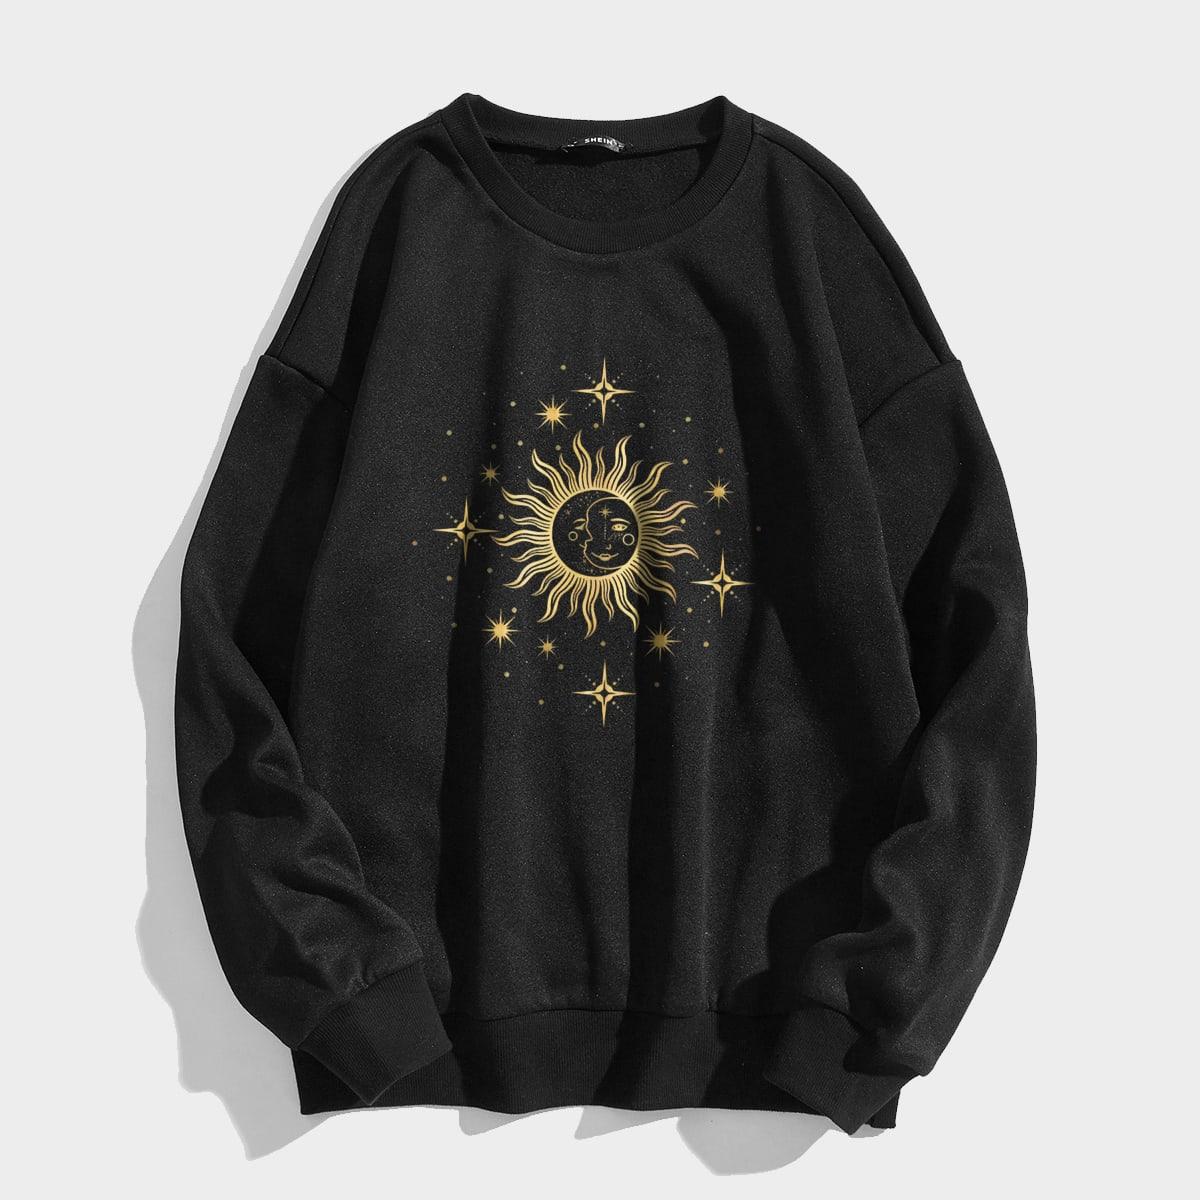 Abstract Sun And Moon Print Oversized Thermal Sweatshirt